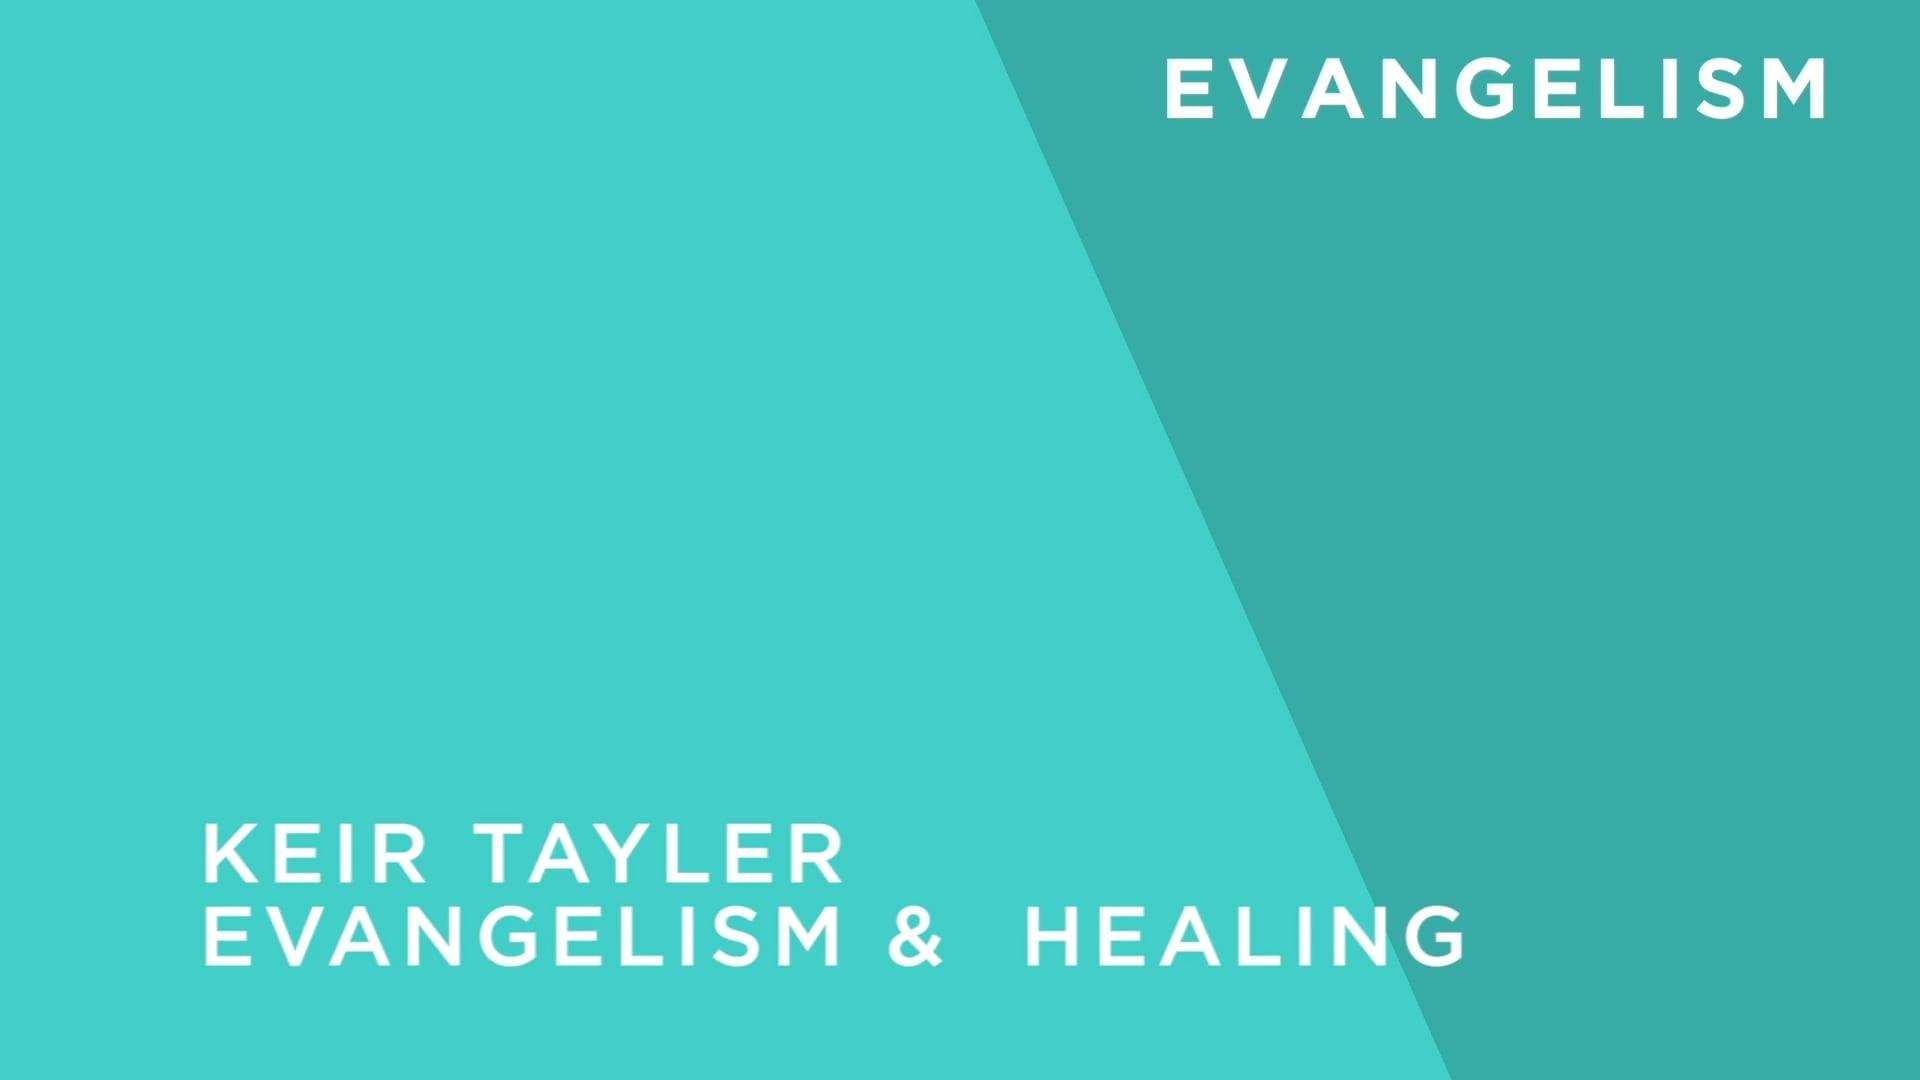 Evangelism and Healing